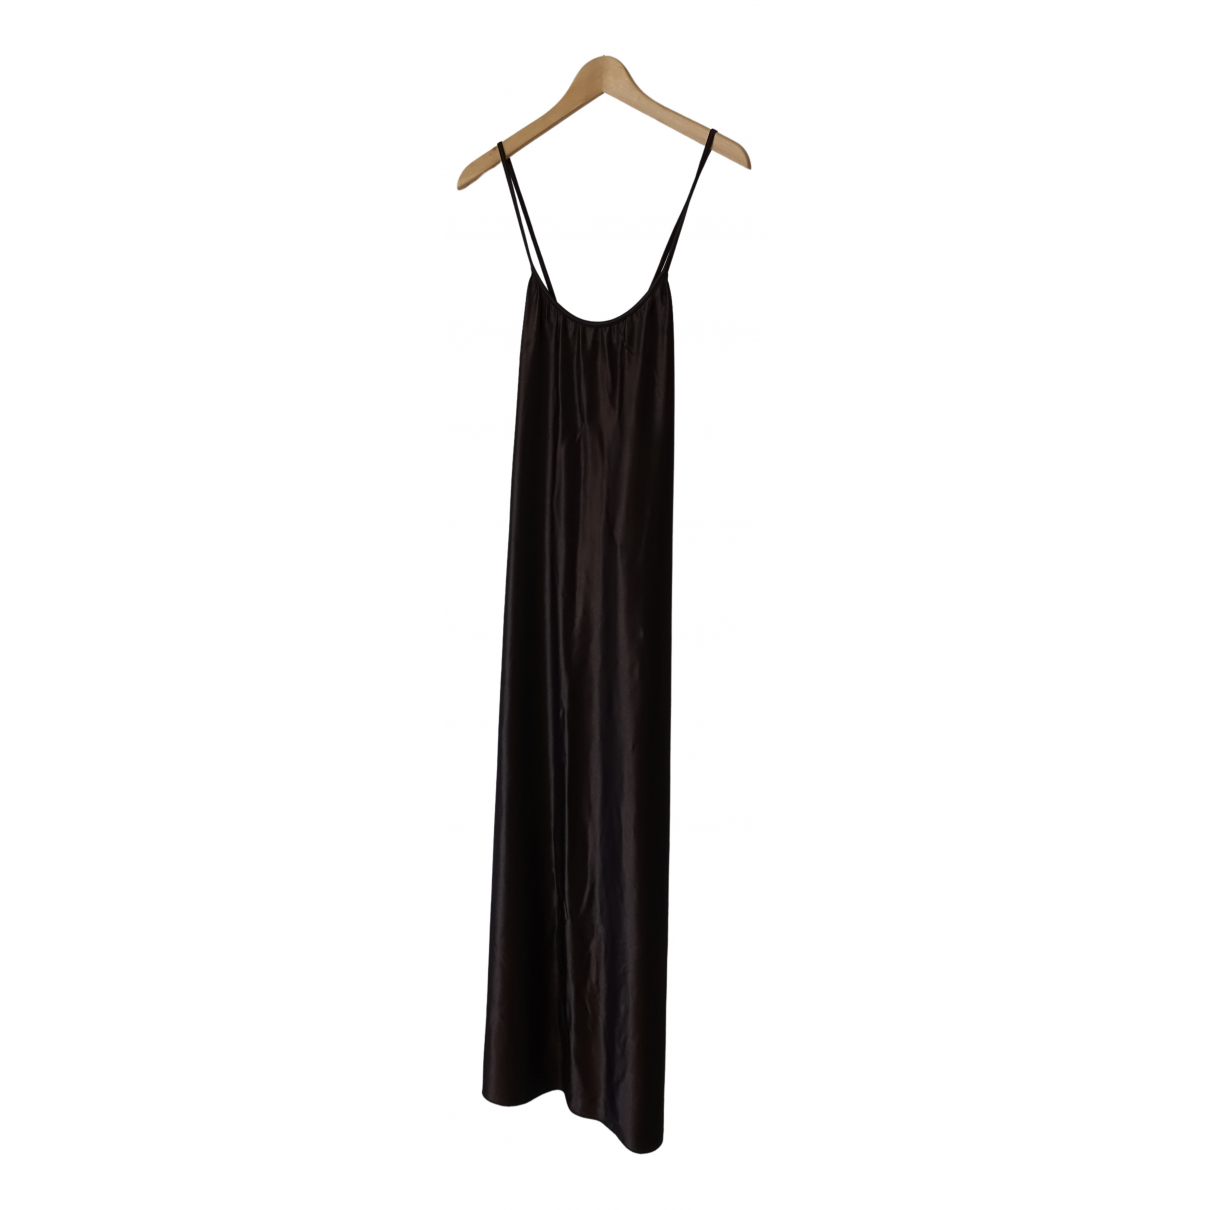 Moschino \N Kleid in  Braun Synthetik